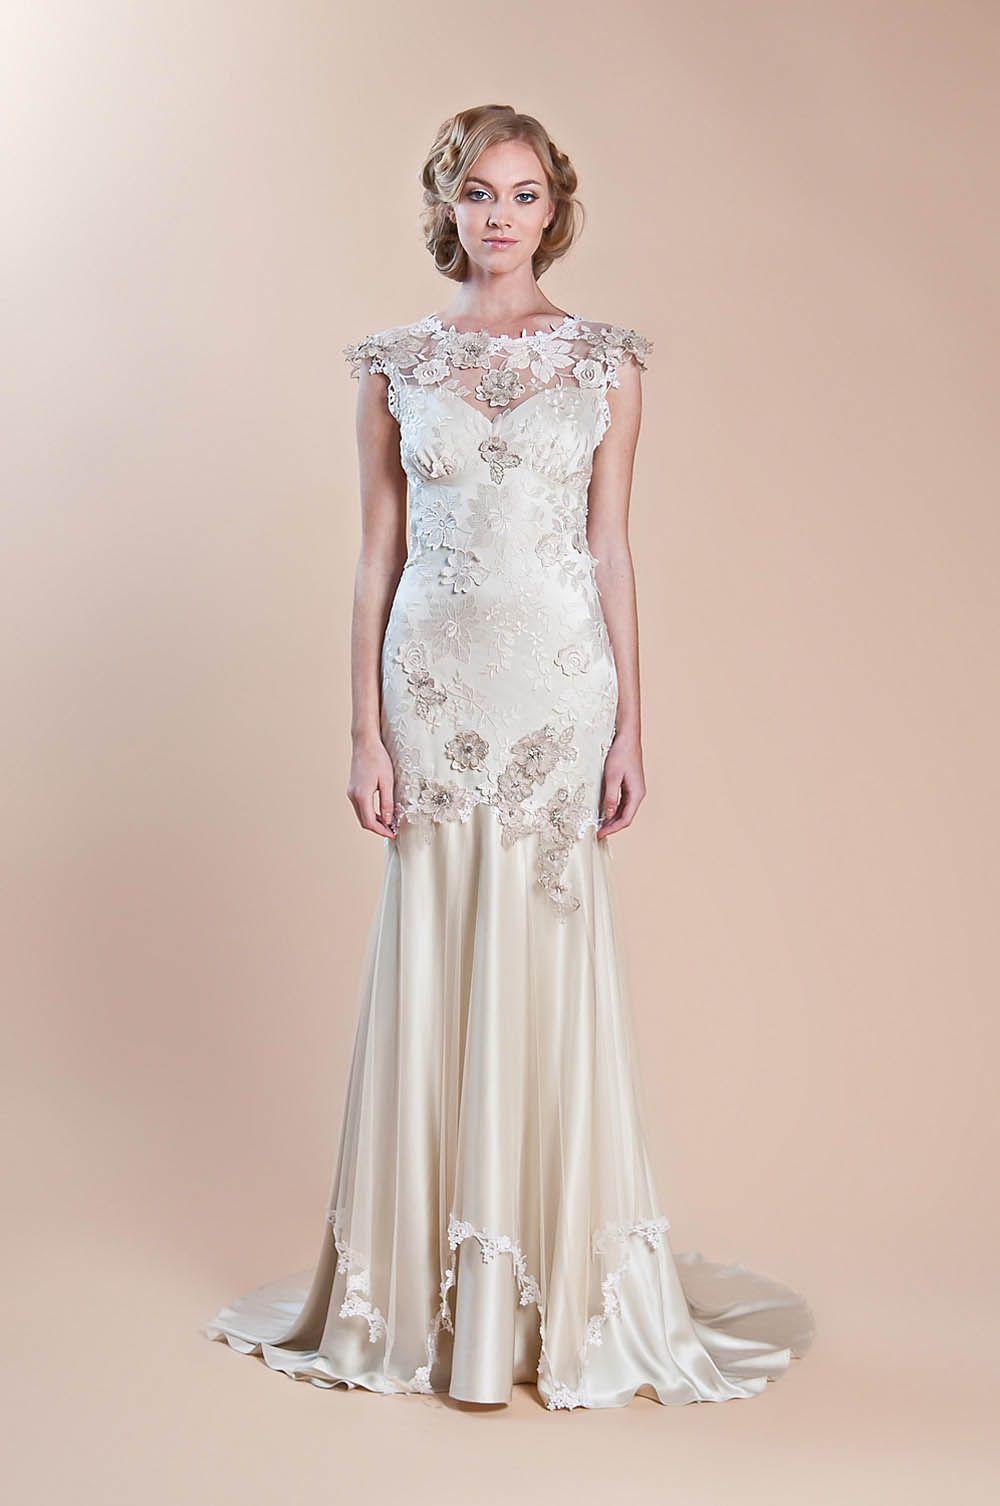 1920 Wedding Dresses For Sale Wedding Dresses For Cheap Check More At Http Svesty Com 1920 Wedding Dresses Lace 1920s Wedding Dress Wedding Dresses Simple